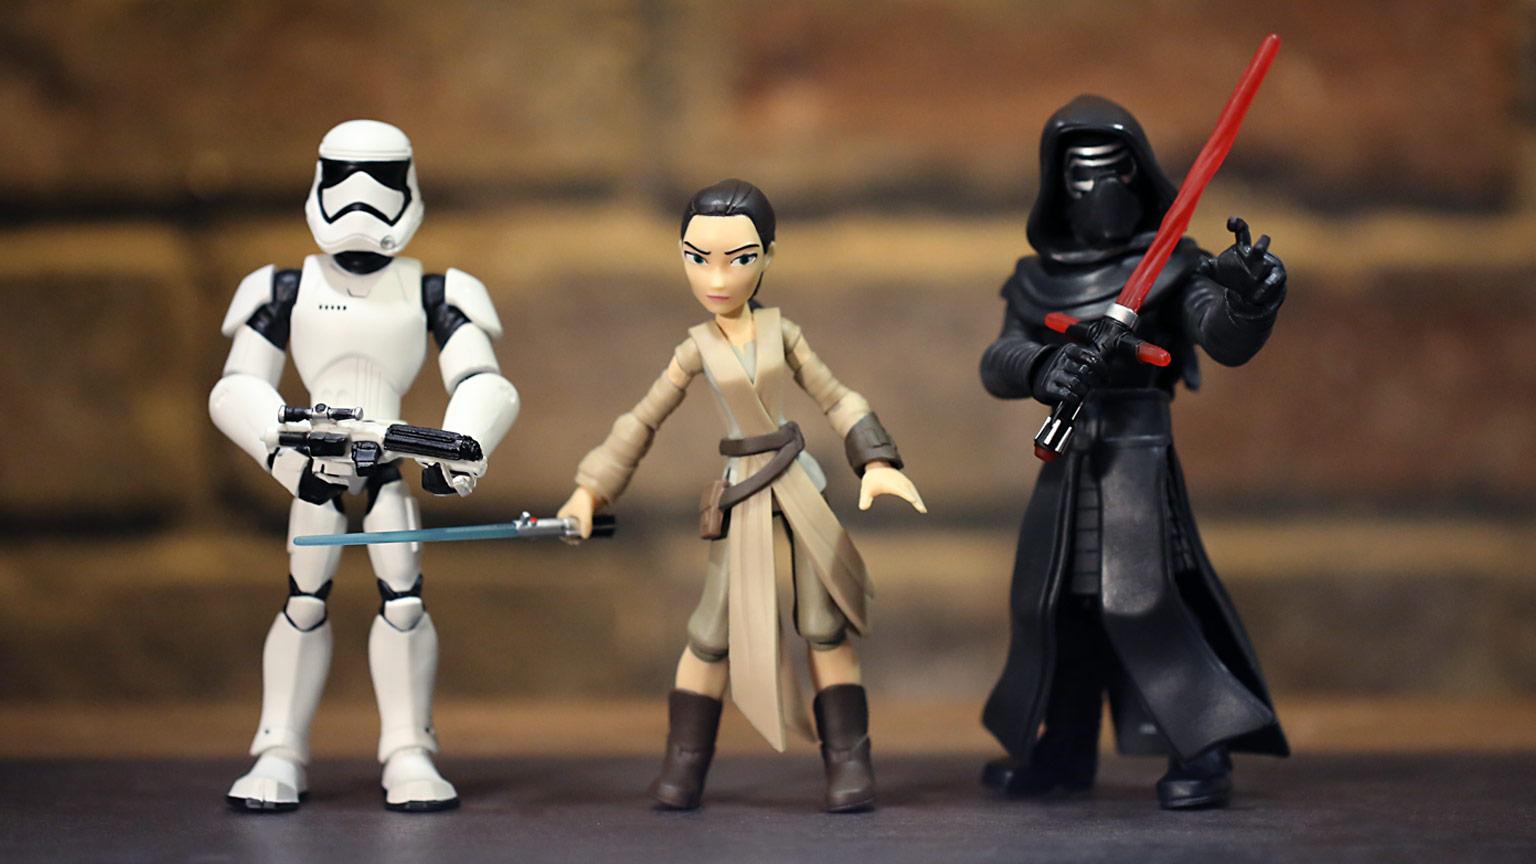 Disney Toybox Action Figures, $10.36 Each (shopDisney Exclusive)